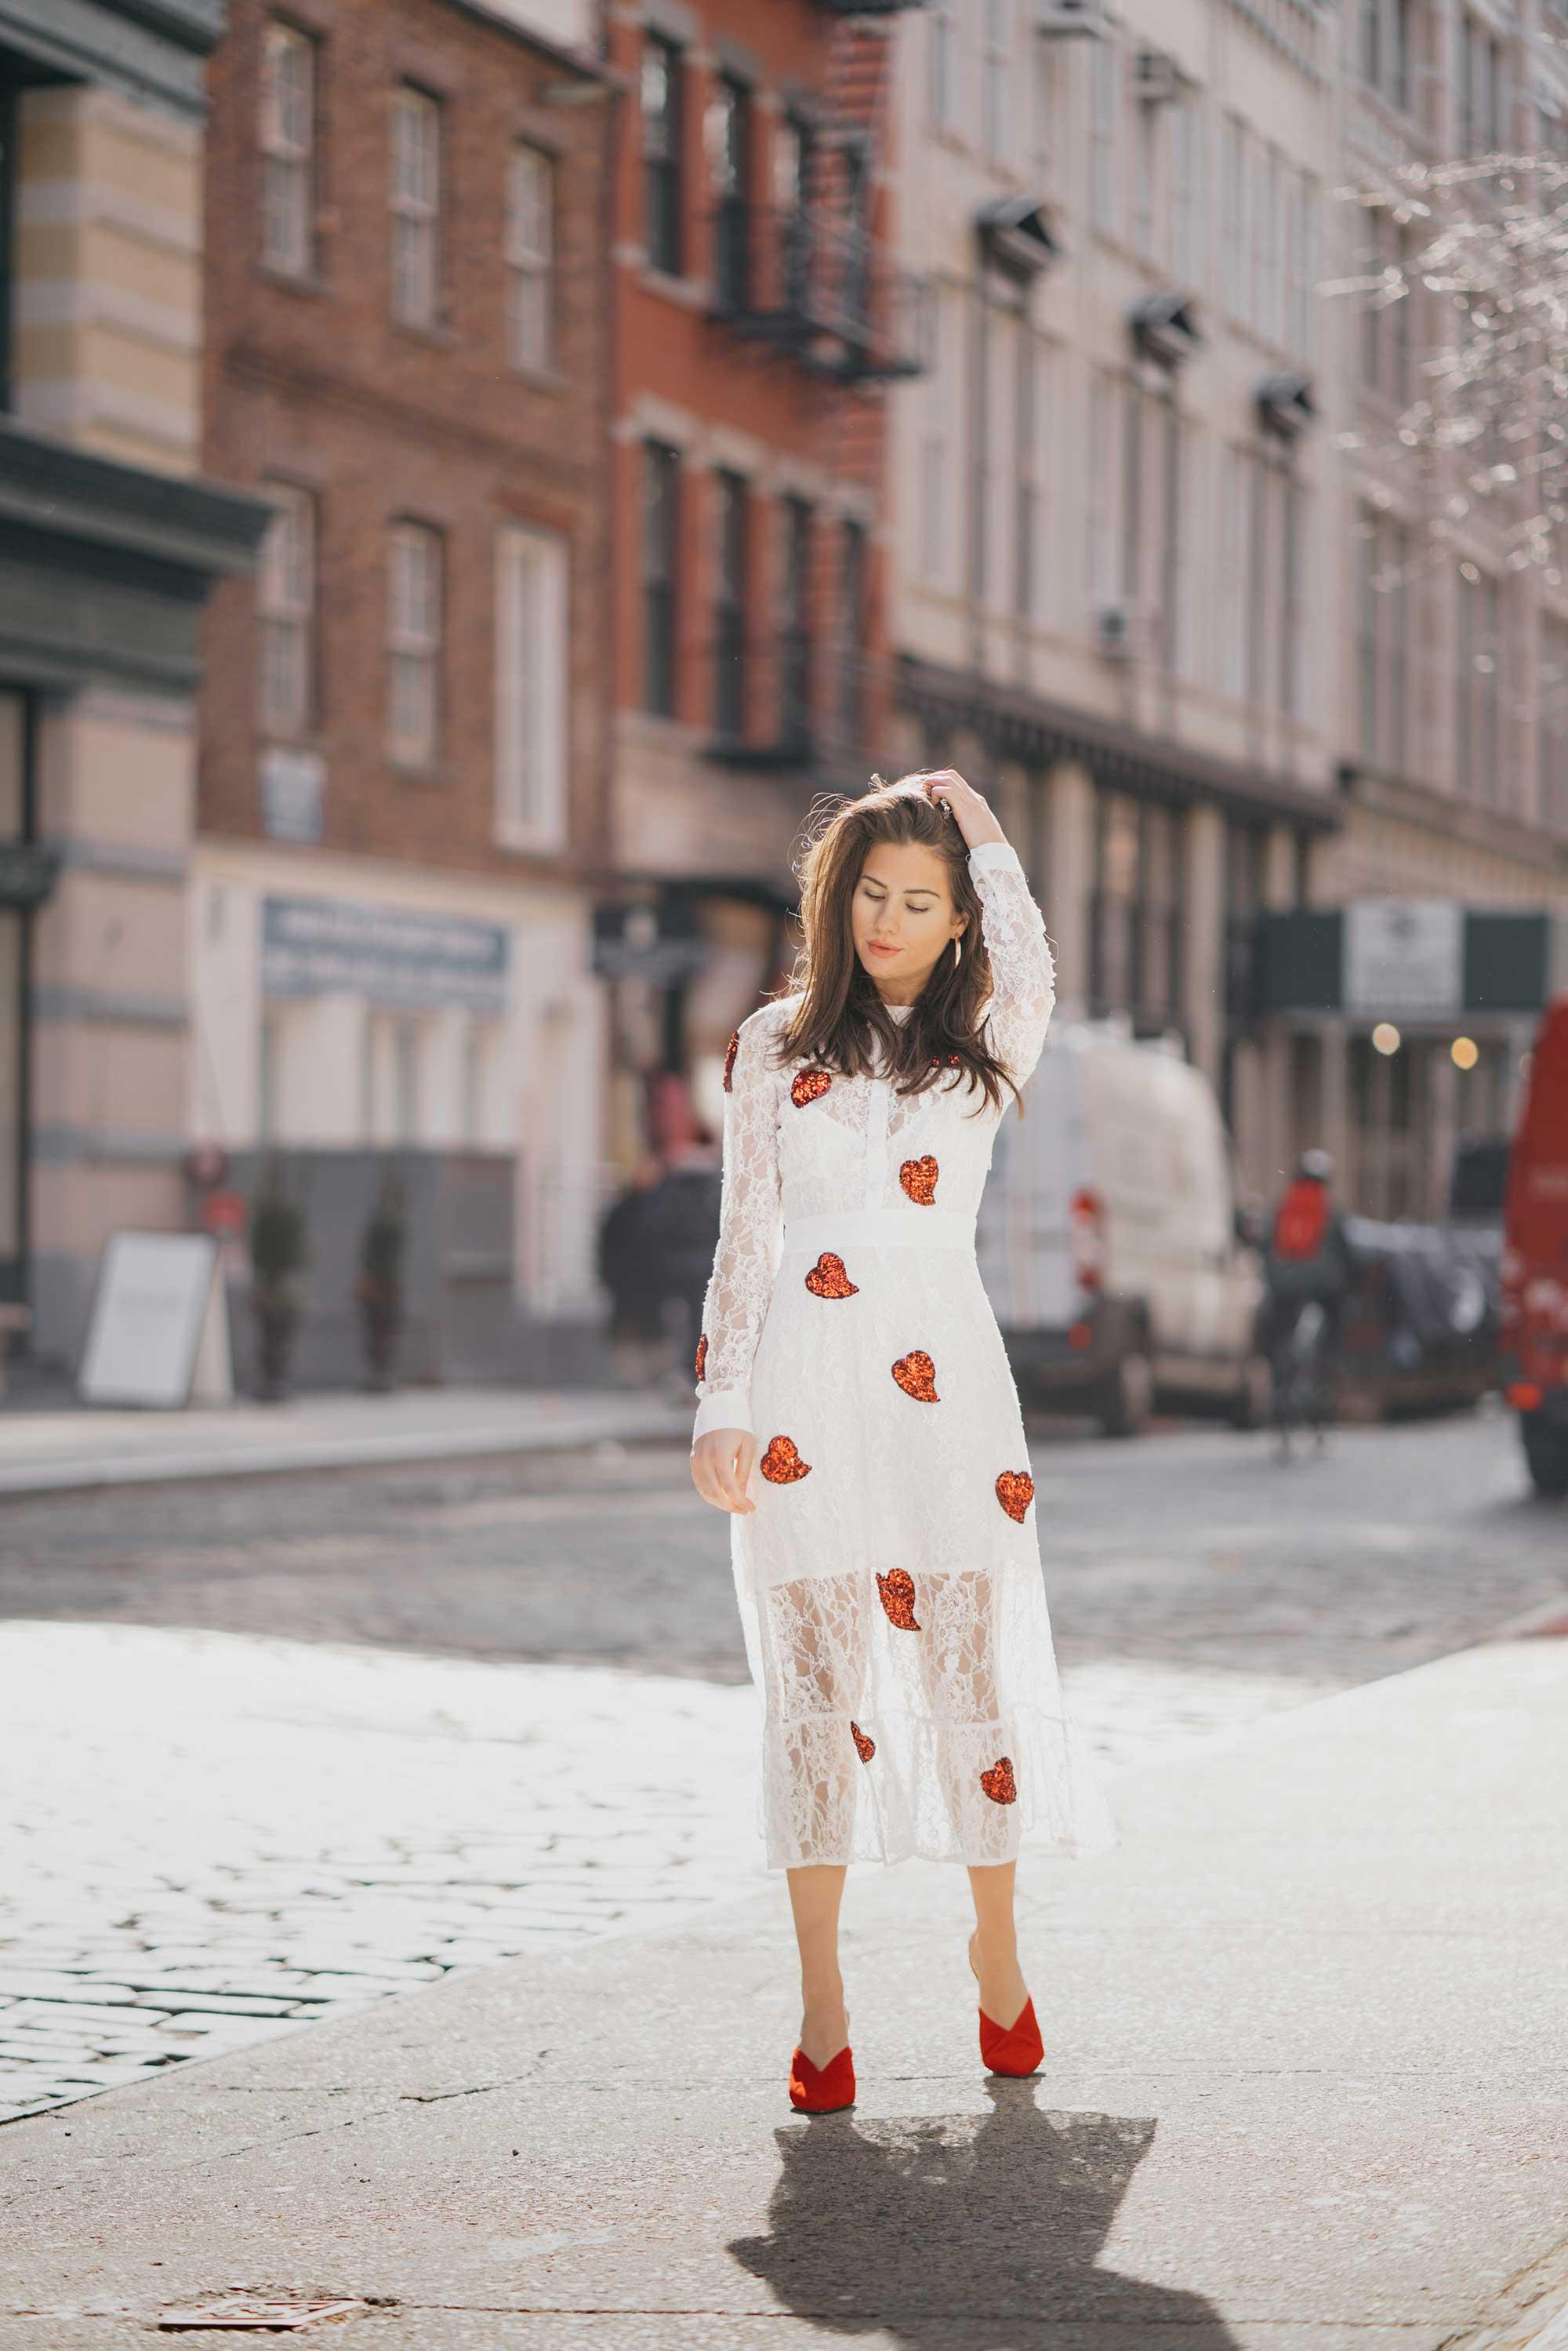 For-Love-and-Lemons-La-Zosia-Midi-Dress-Sheer-lace-sequin-heart-applique7.jpg